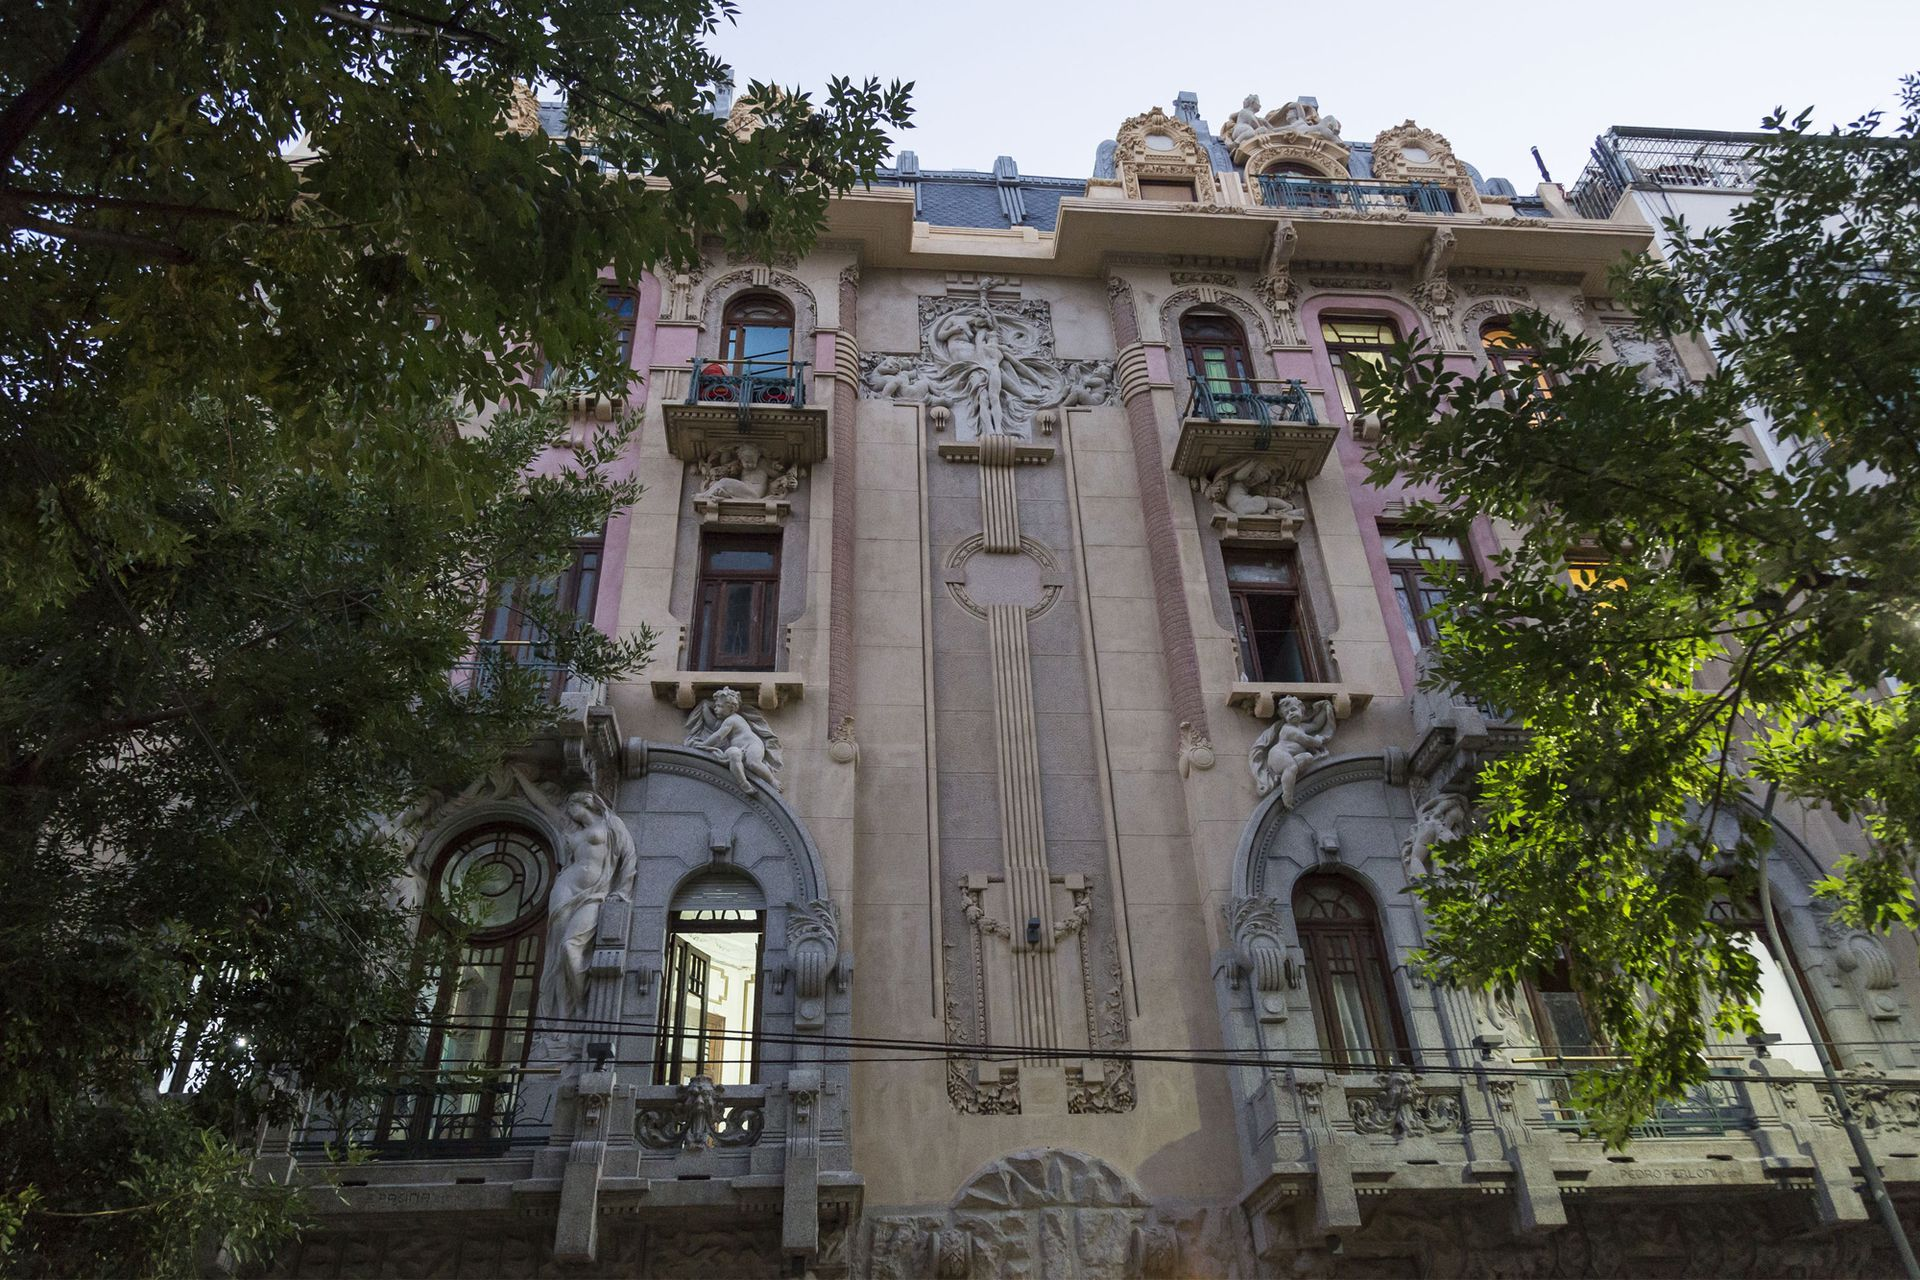 Fachada de la famosa Casa Calise, obra del arquitecto Virginio Colombo, en Hipólito Irigoyen 2562, Balvanera.